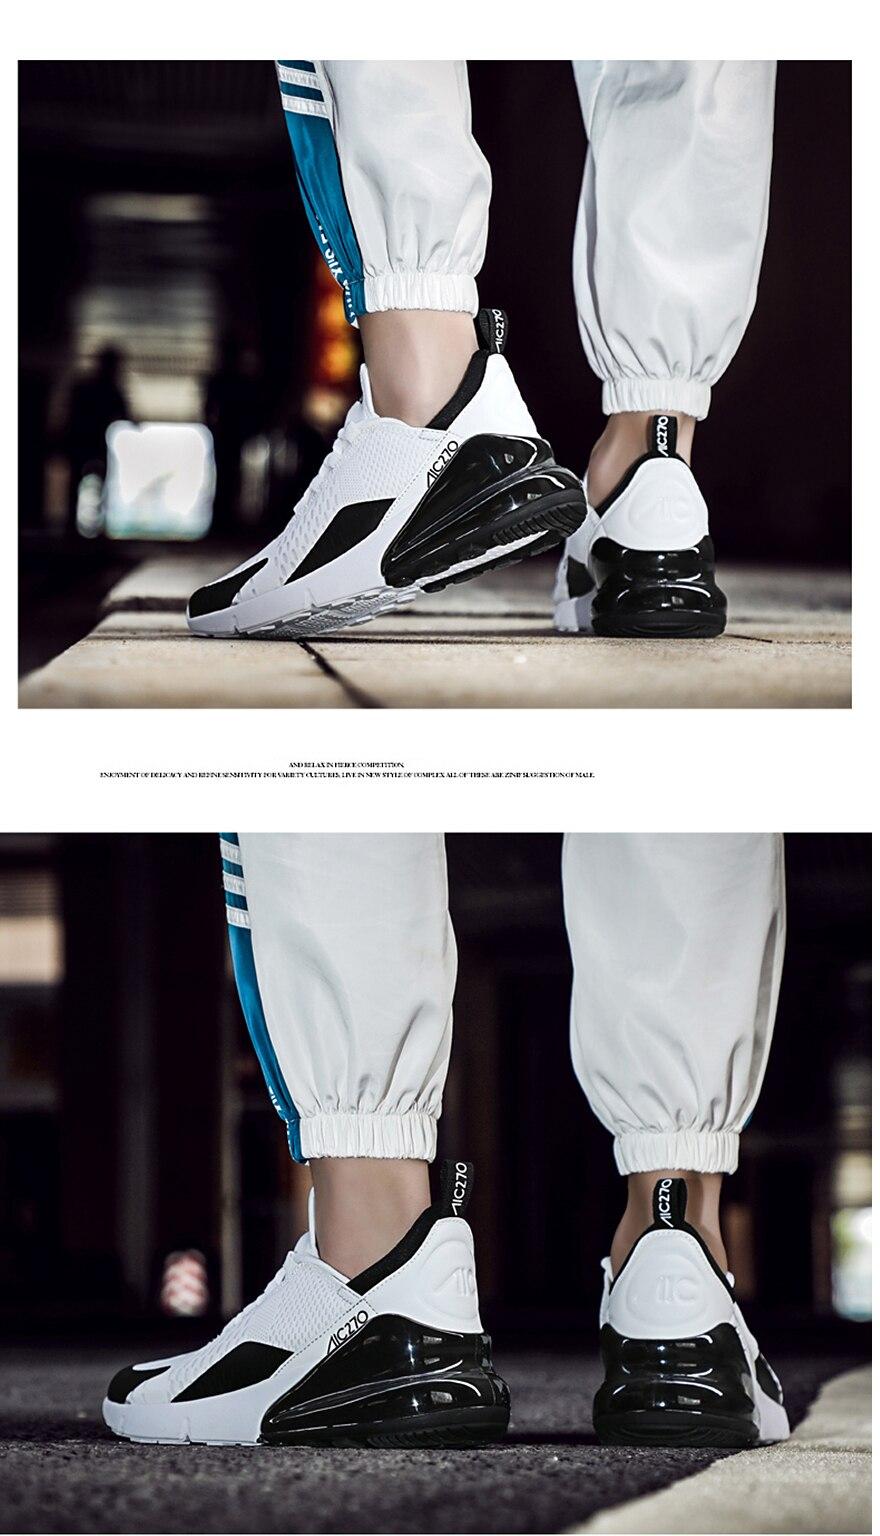 HTB1ZeQaRhjaK1RjSZFAq6zdLFXaD 2019 Casual Shoes Men Lightweight Running Male Shoes Breathable Mesh Sport Men Sneakers Flat Outdoor Footwear Summer Trainers